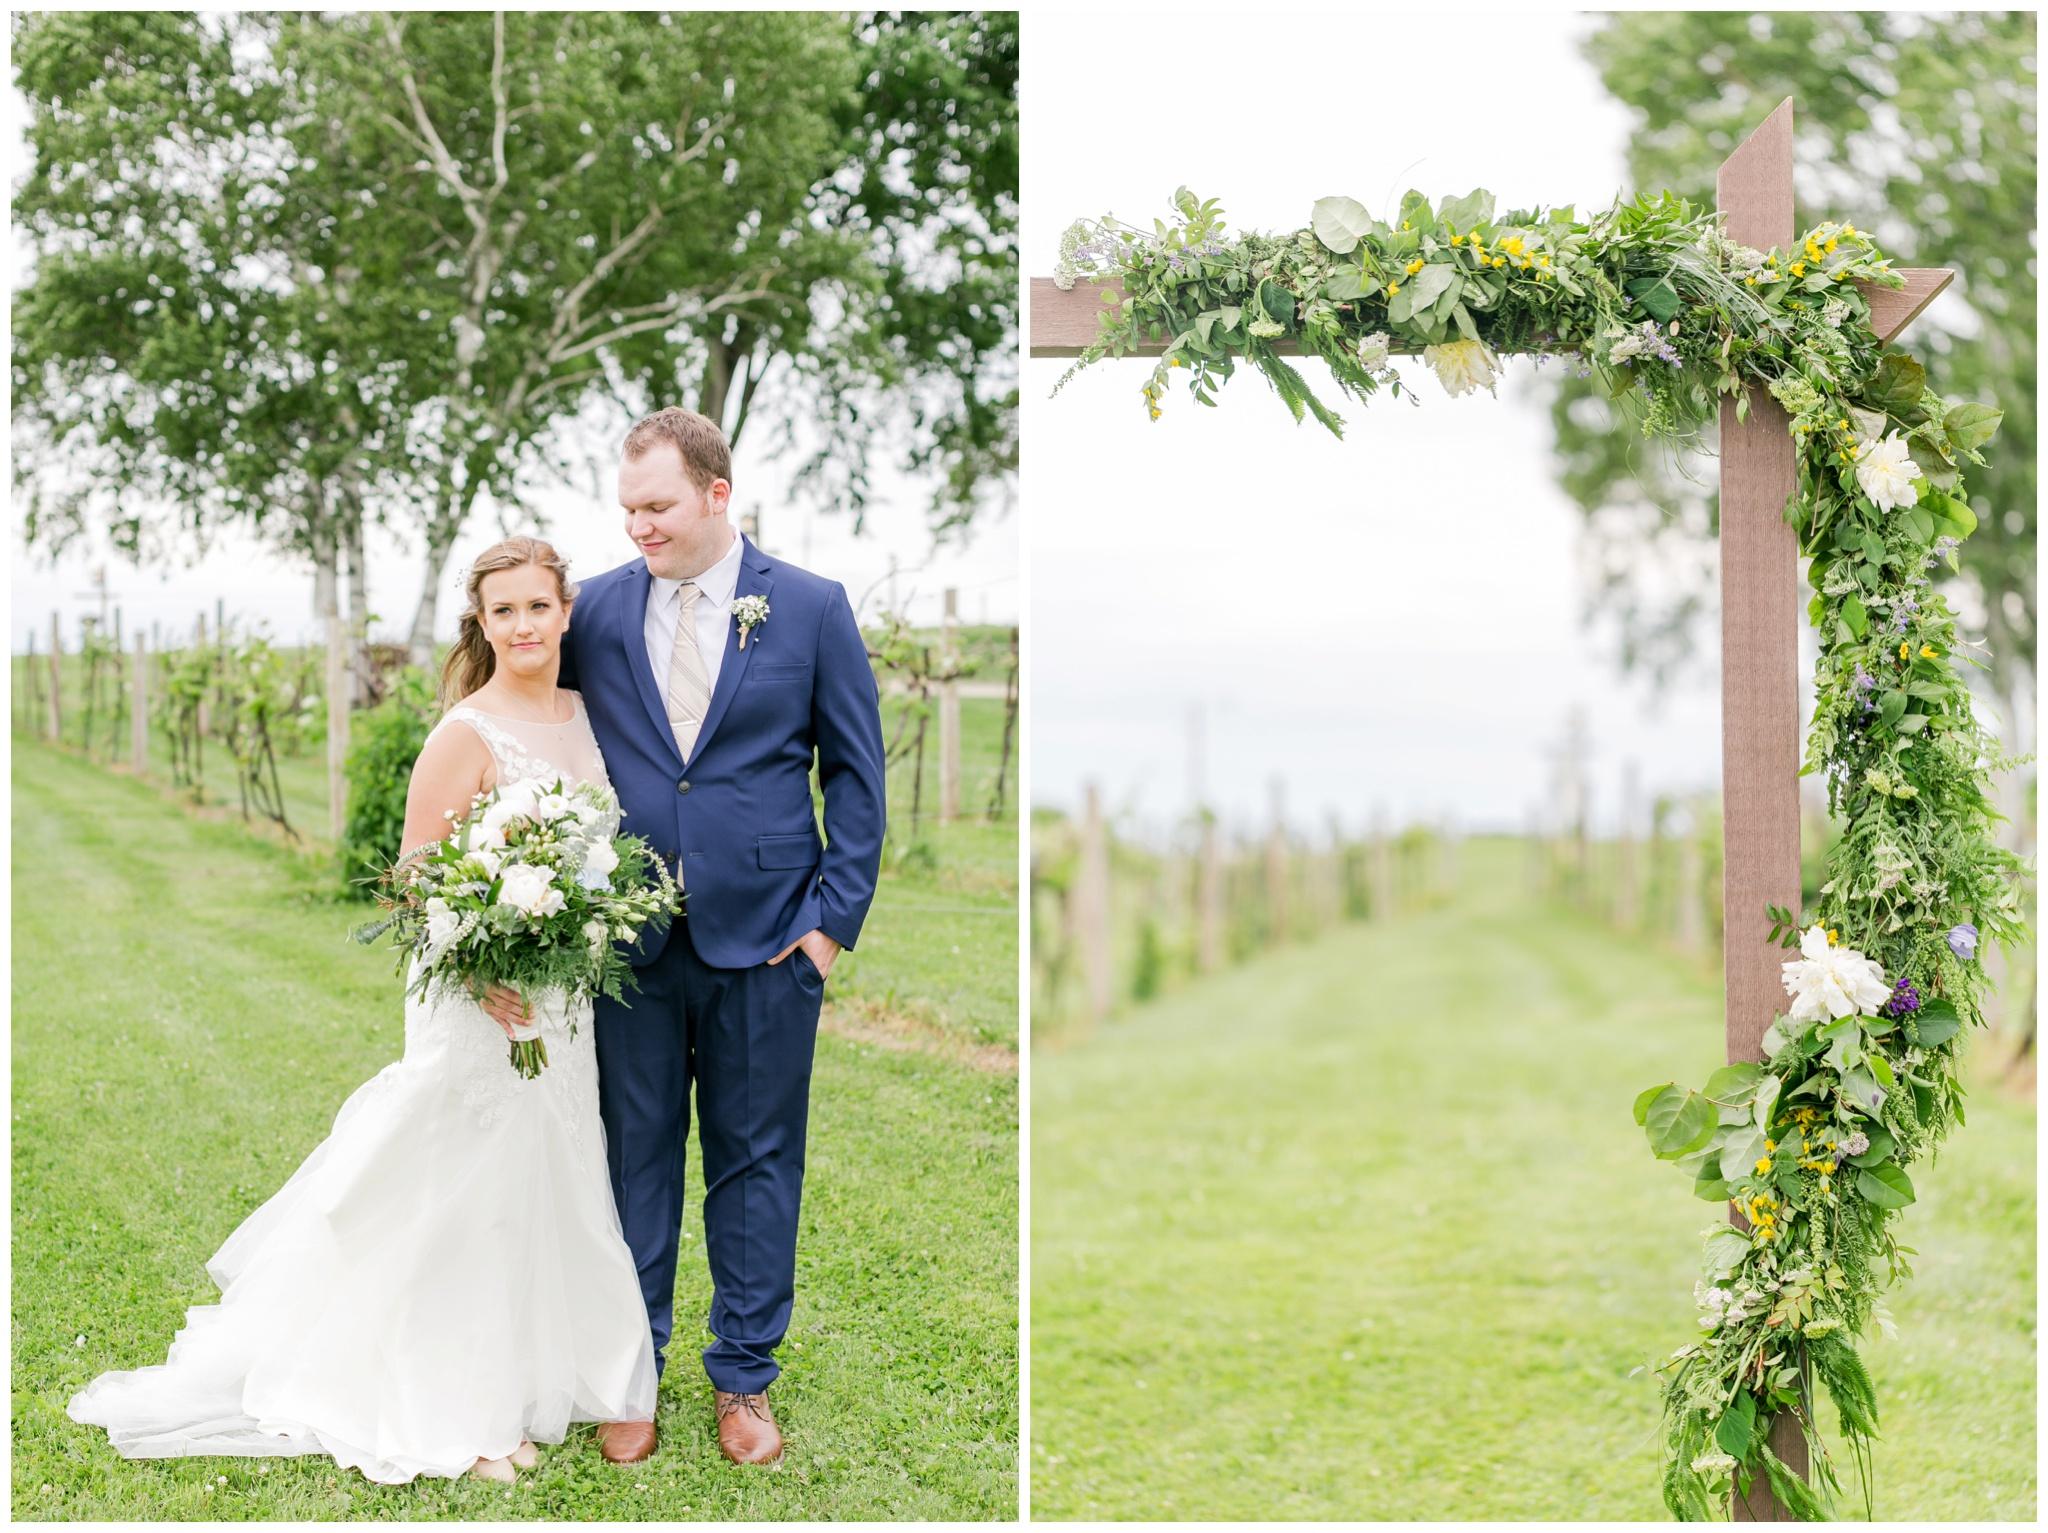 over_the_vines_wedding_edgerton_wisconsin_wedding_caynay_photo_4010.jpg